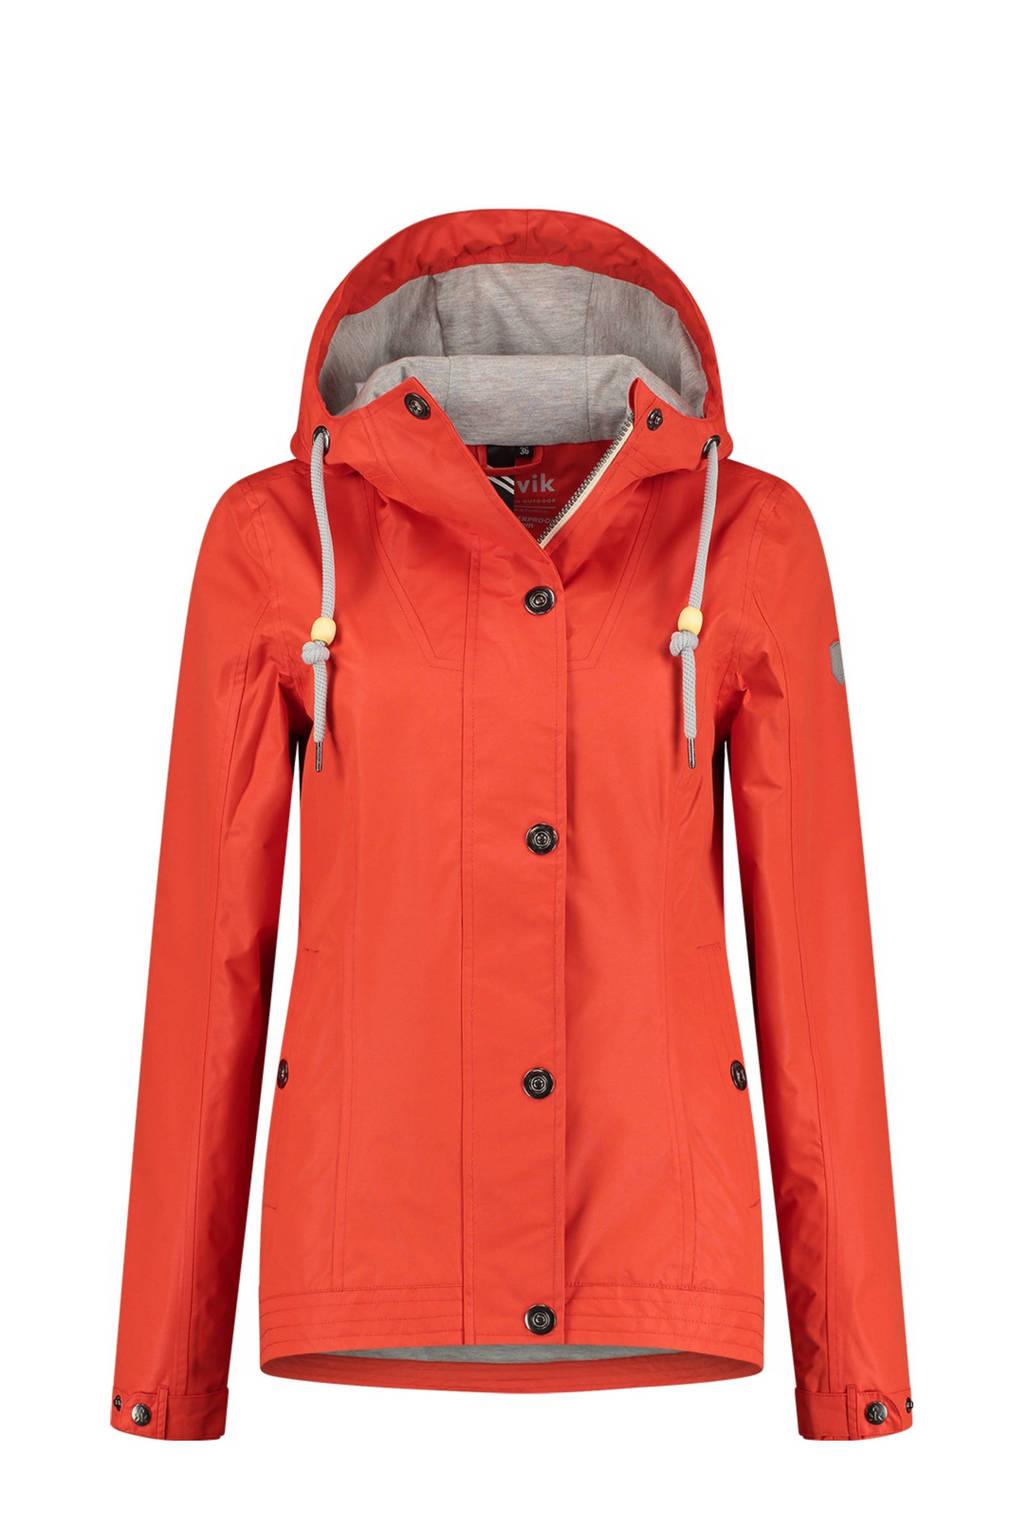 Kjelvik outdoor jas Seana oranje, Oranje